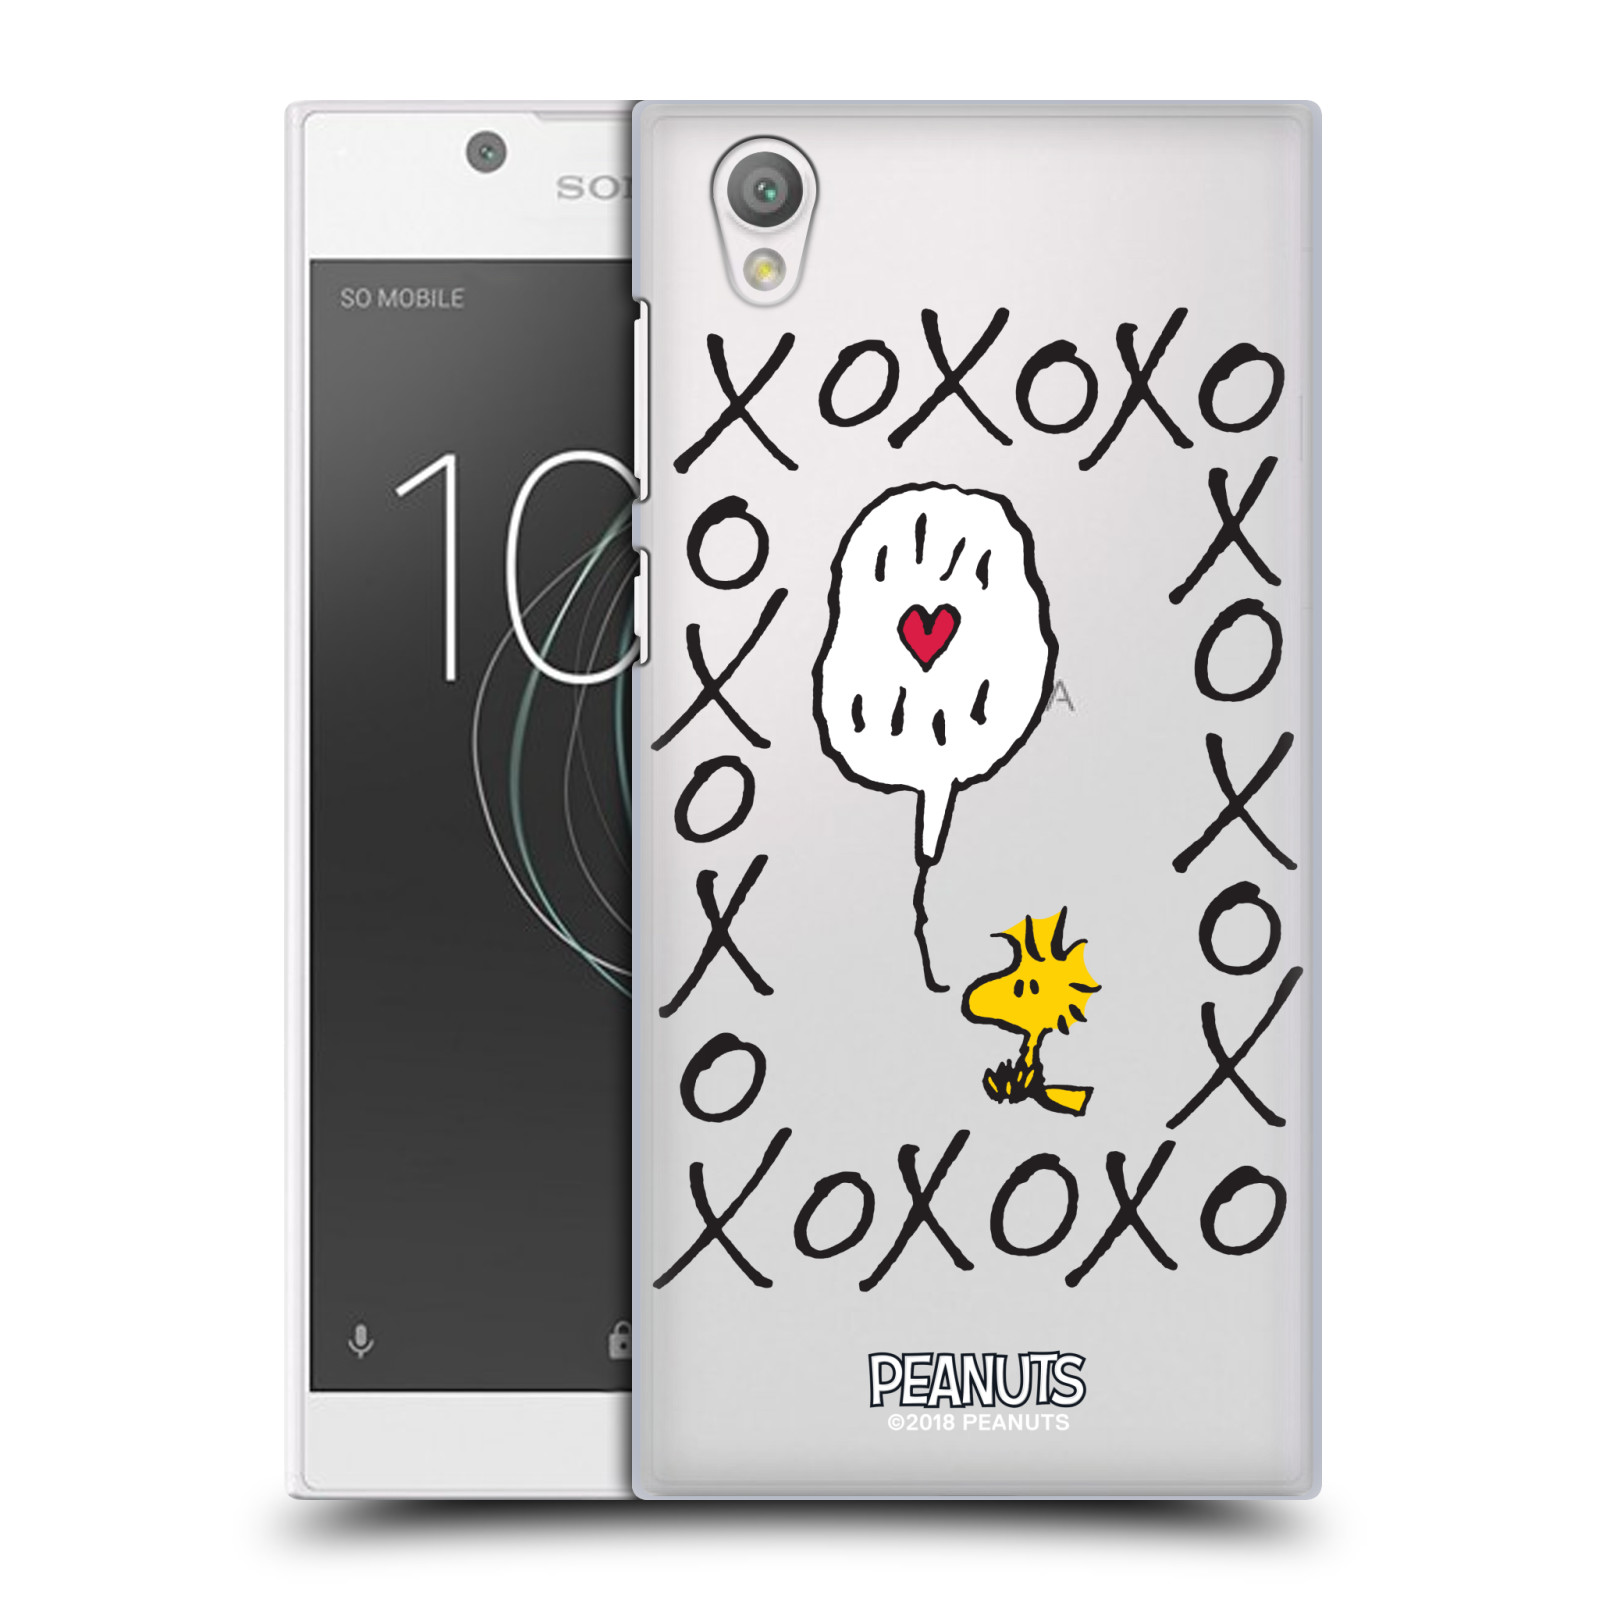 Pouzdro na mobil Sony Xperia L1 Oficiální motiv Peanuts ptáček Woodstock srdíčko